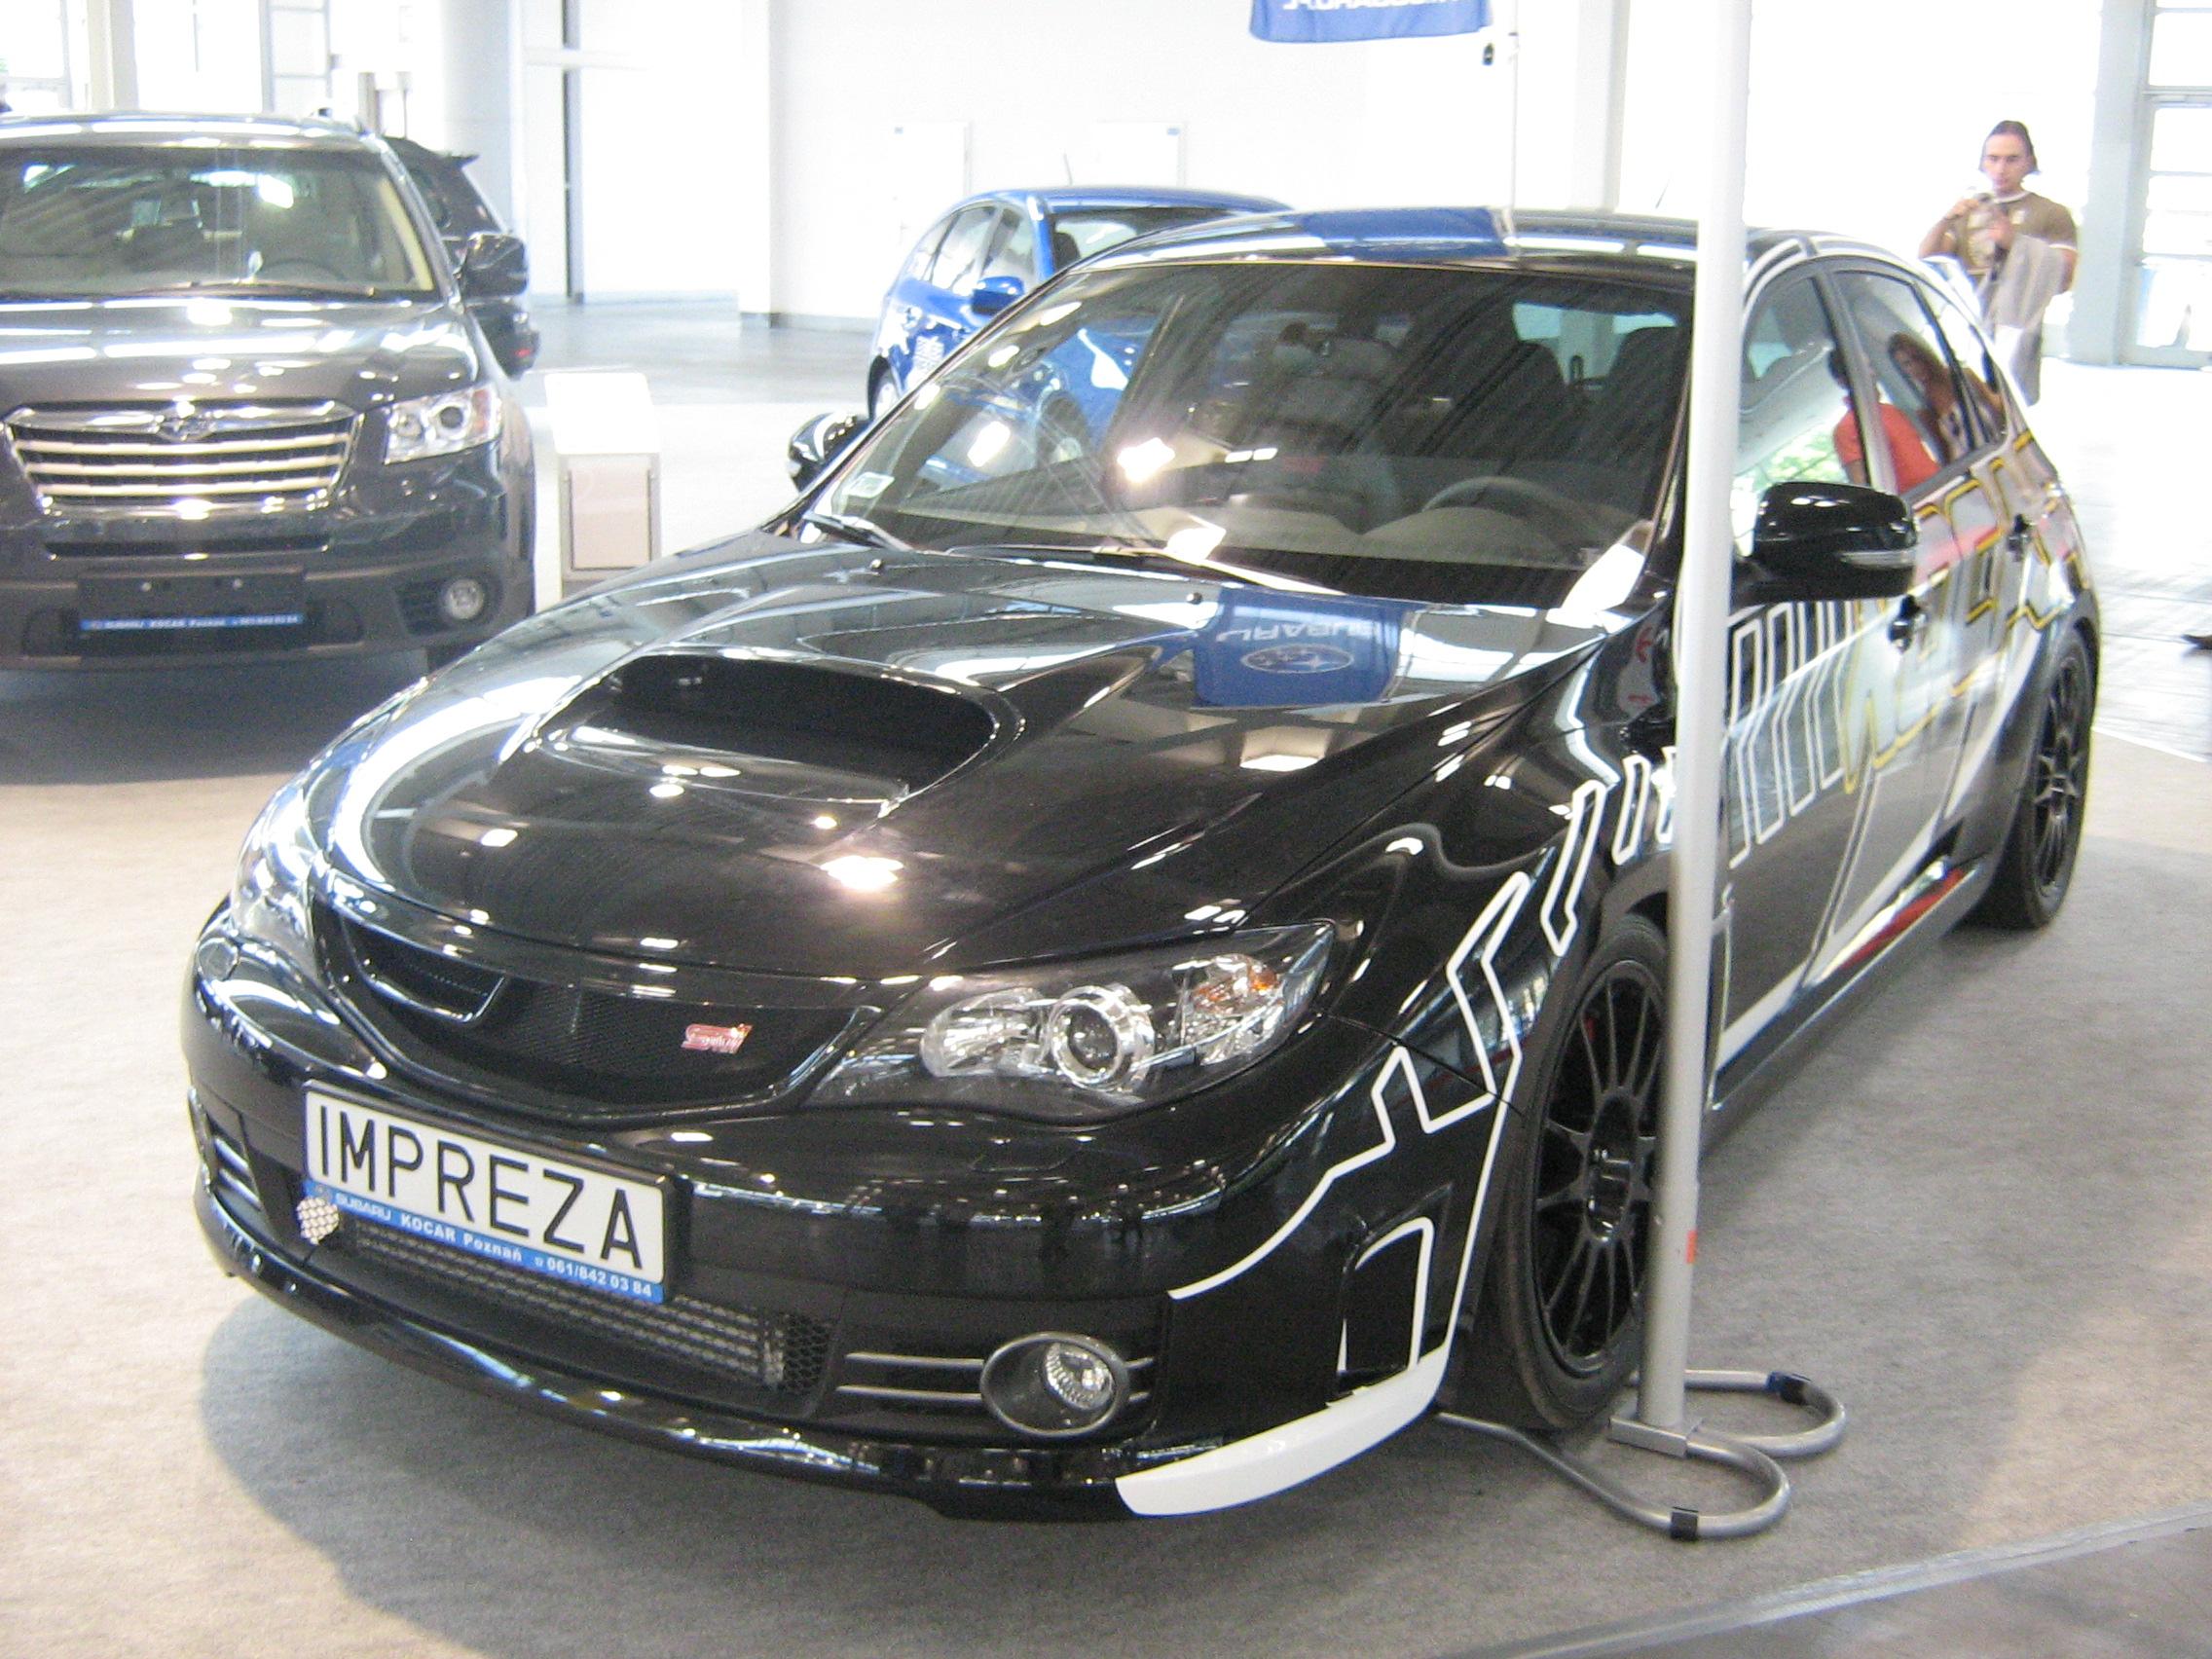 Wrx Car Cover